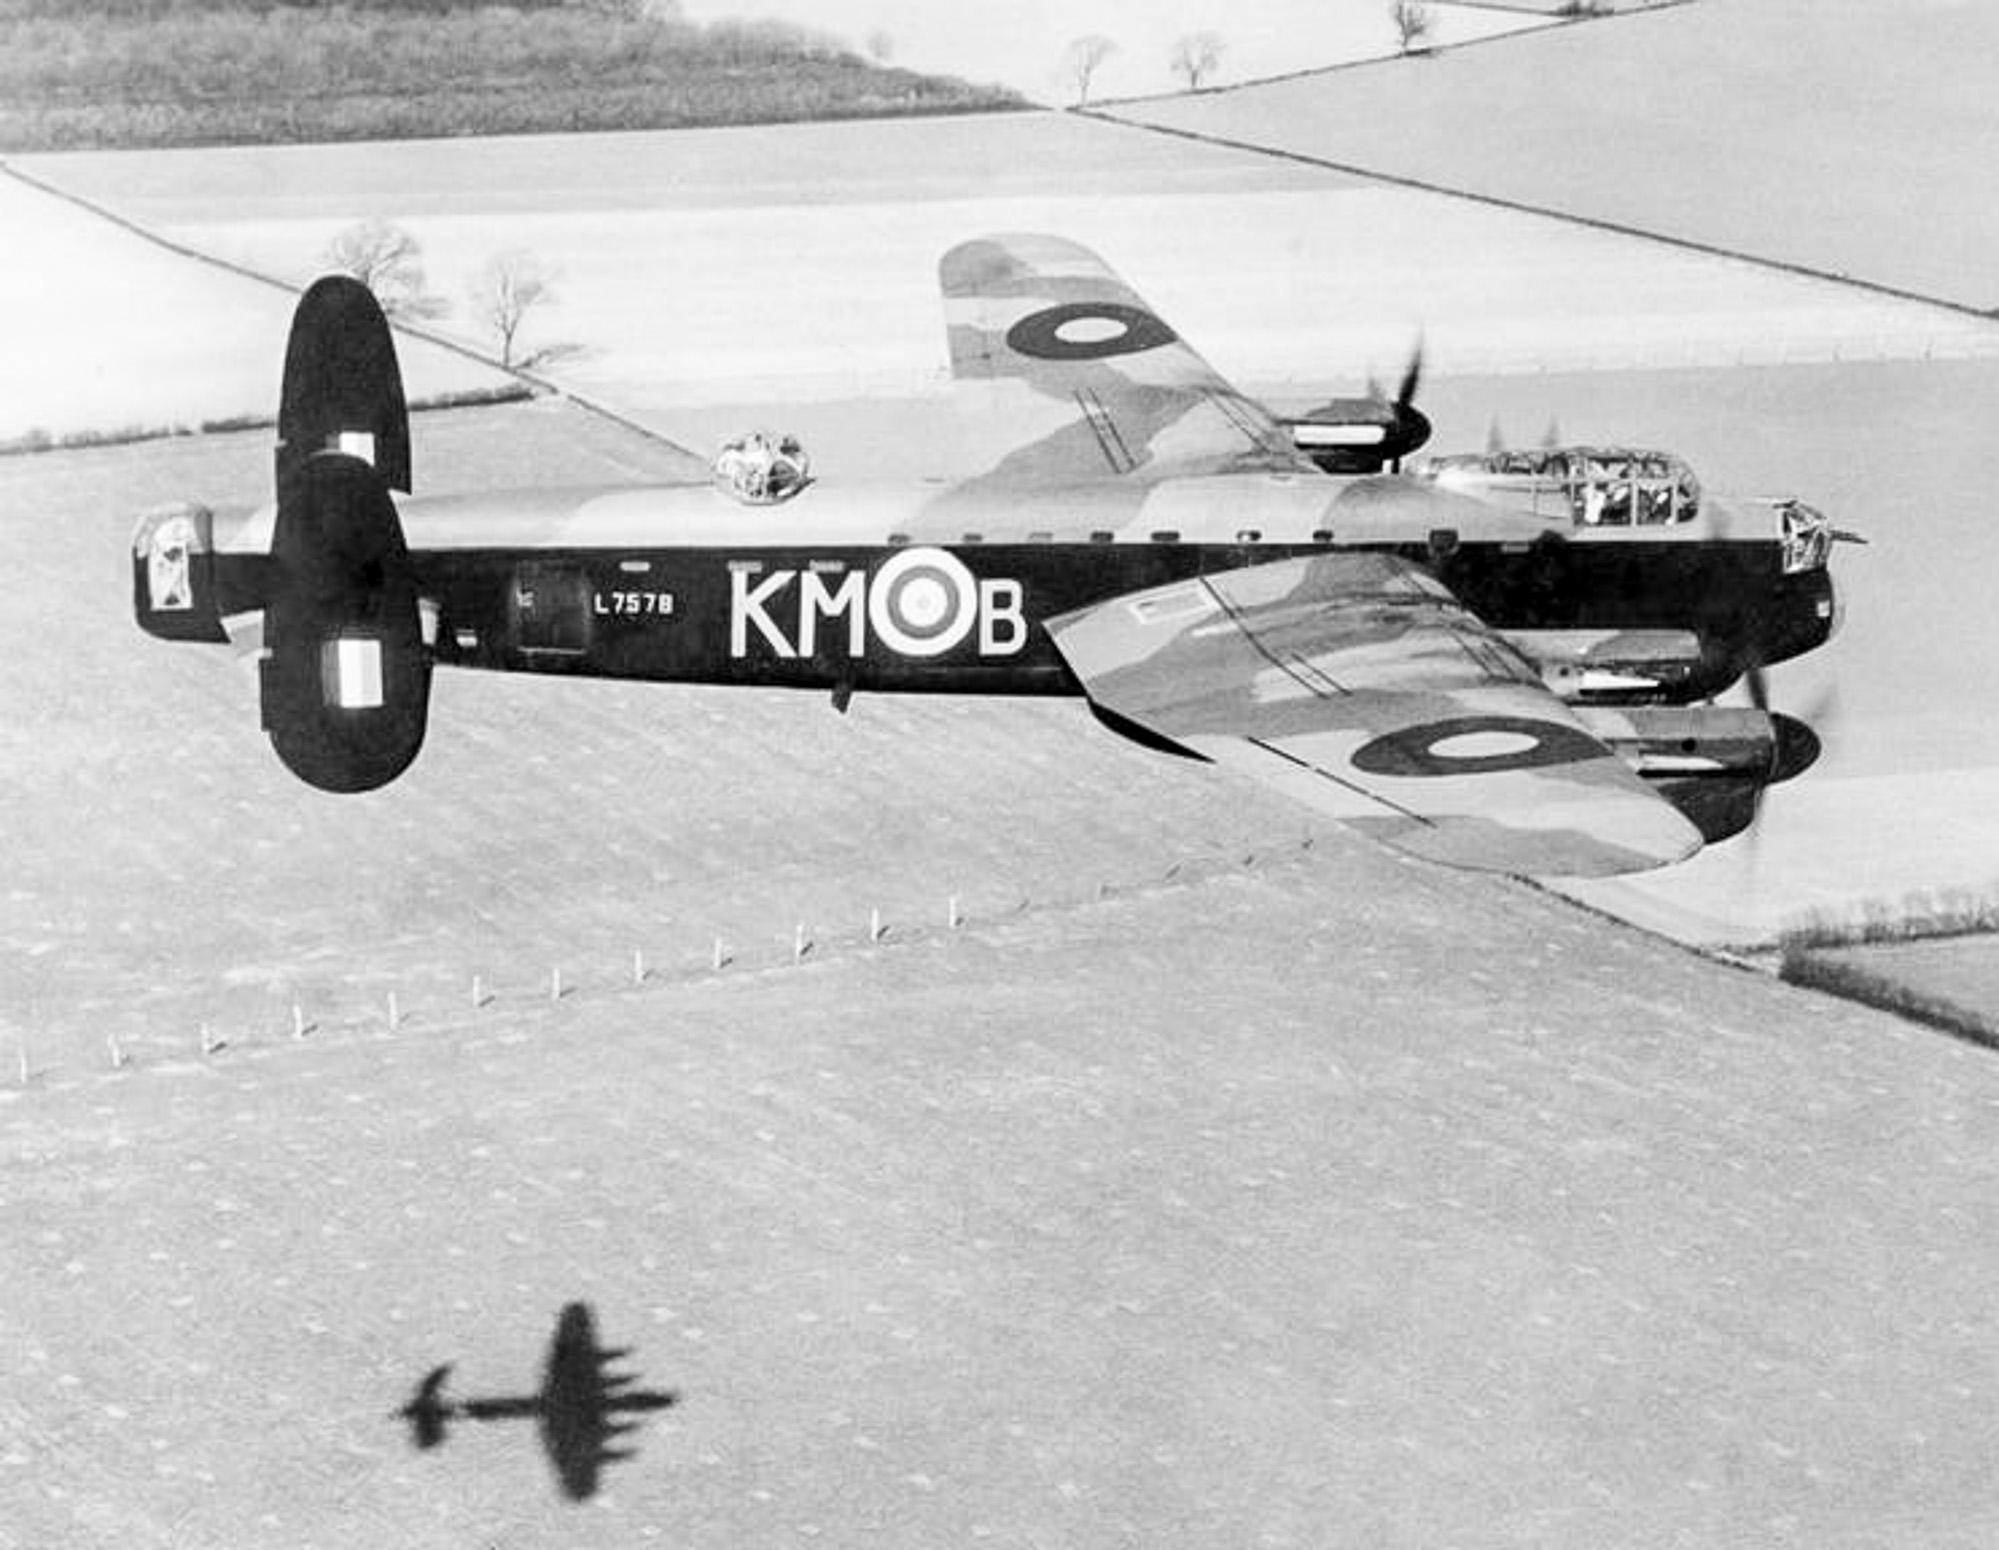 Lancaster Mark I - L7579